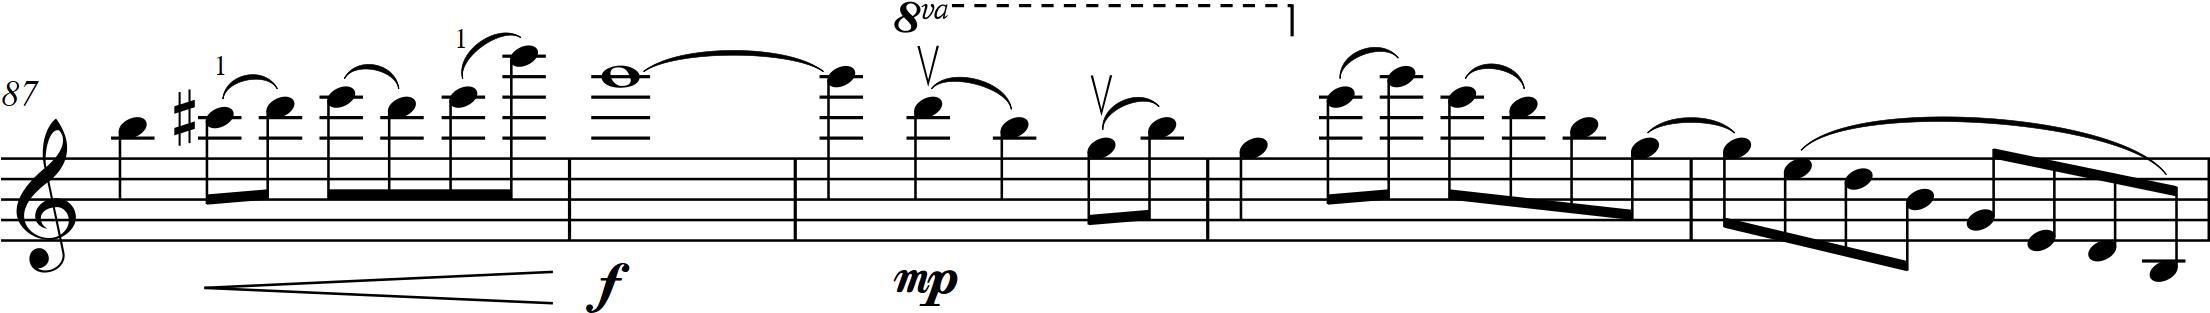 G8 Alwyn - Allegro e grazioso - 87-91 vln